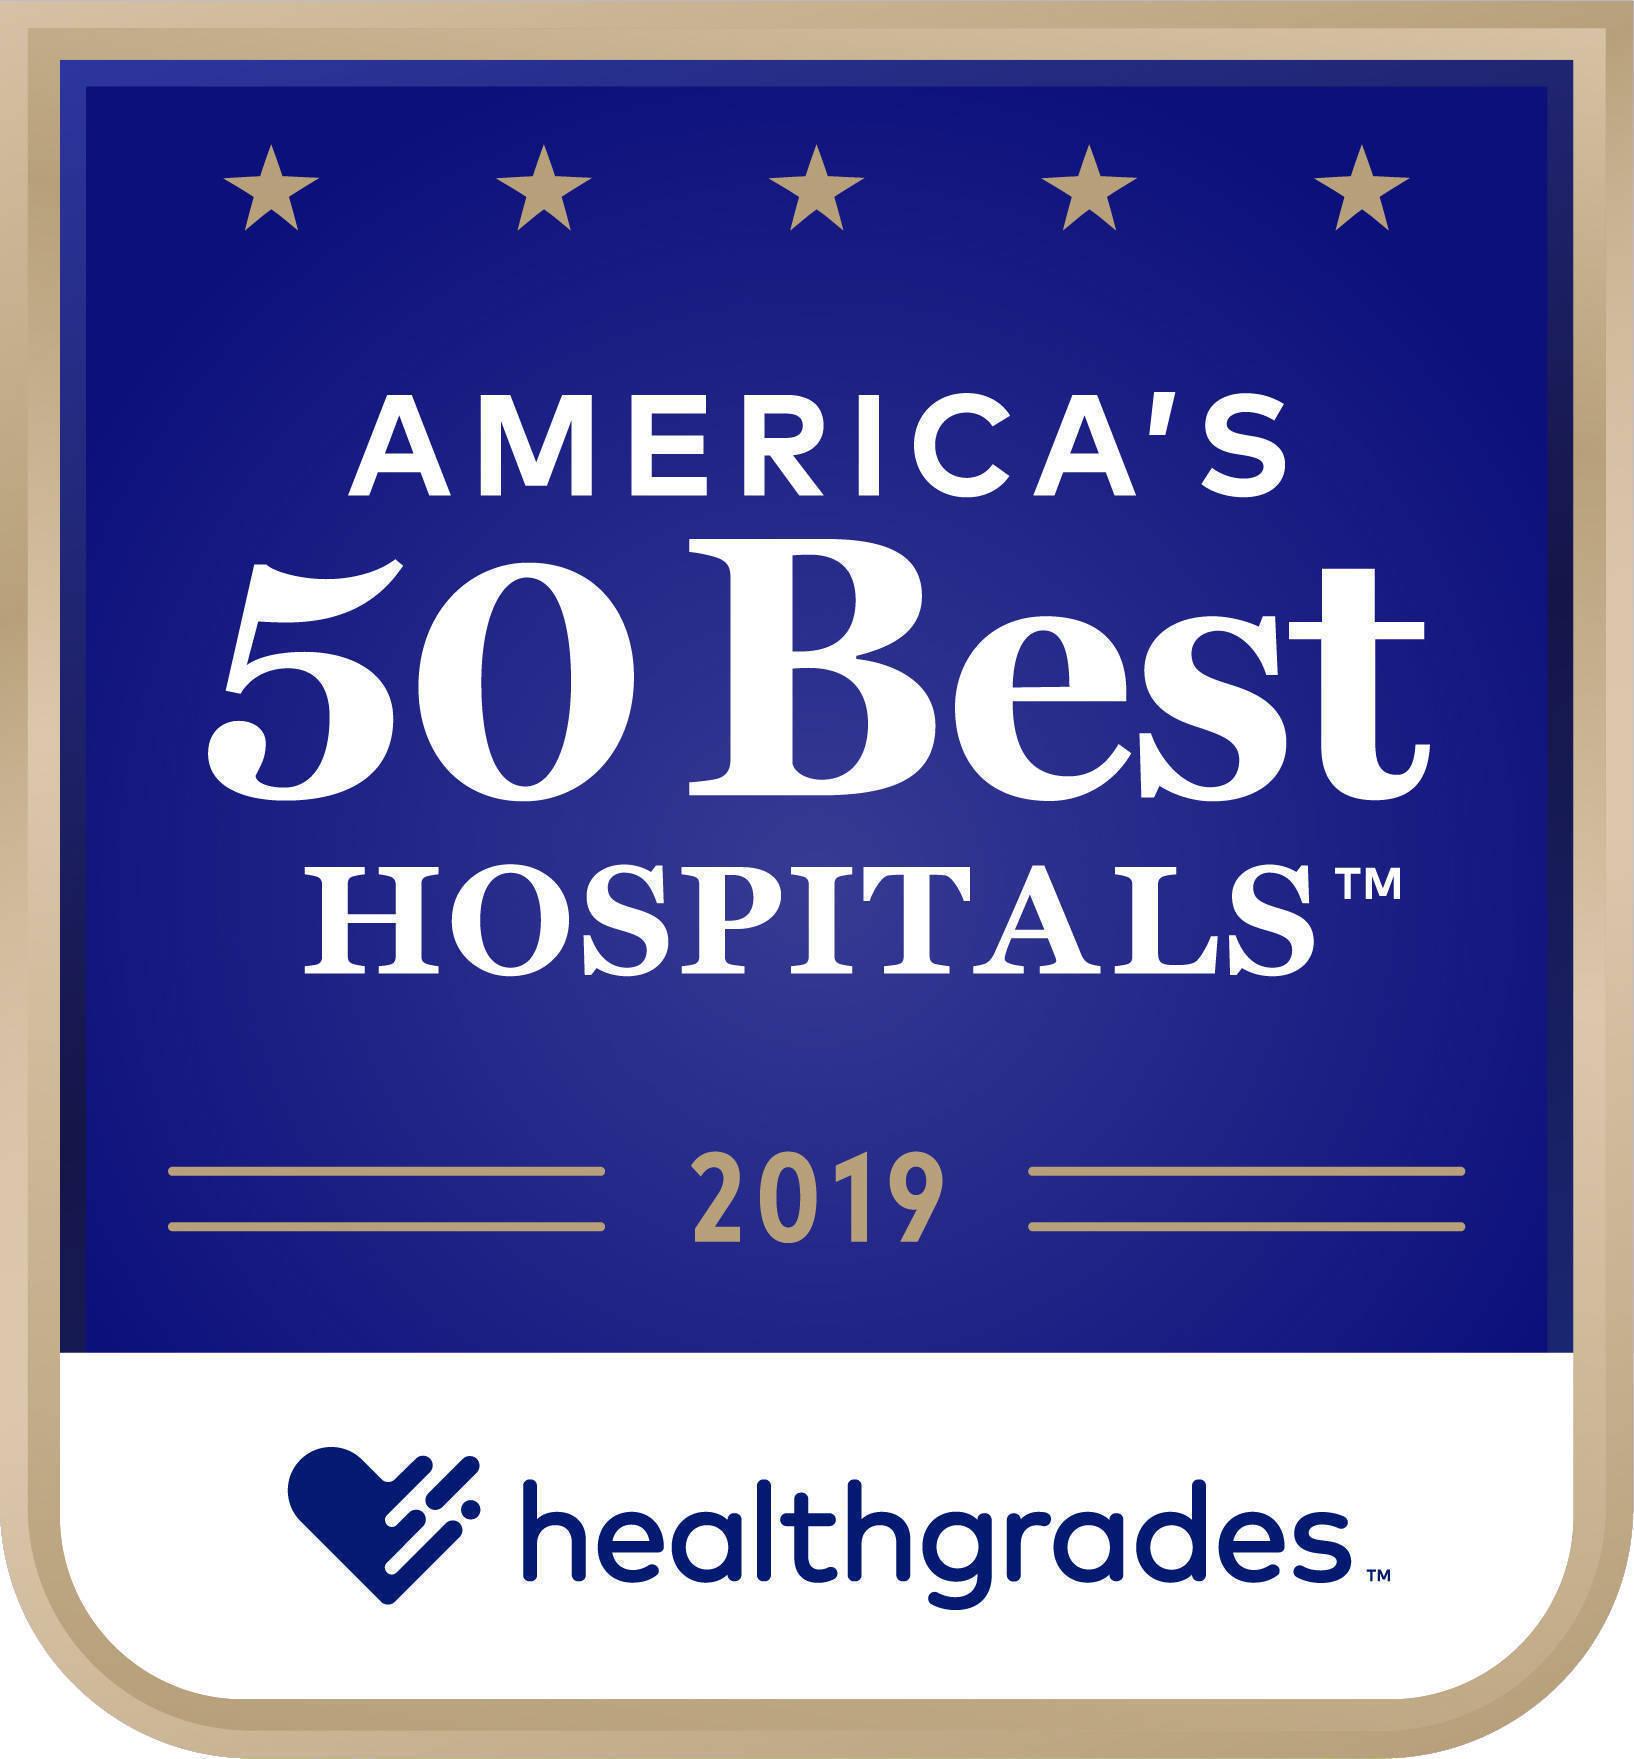 HG_Americas_50_Best_Award_Image_2019.jpg